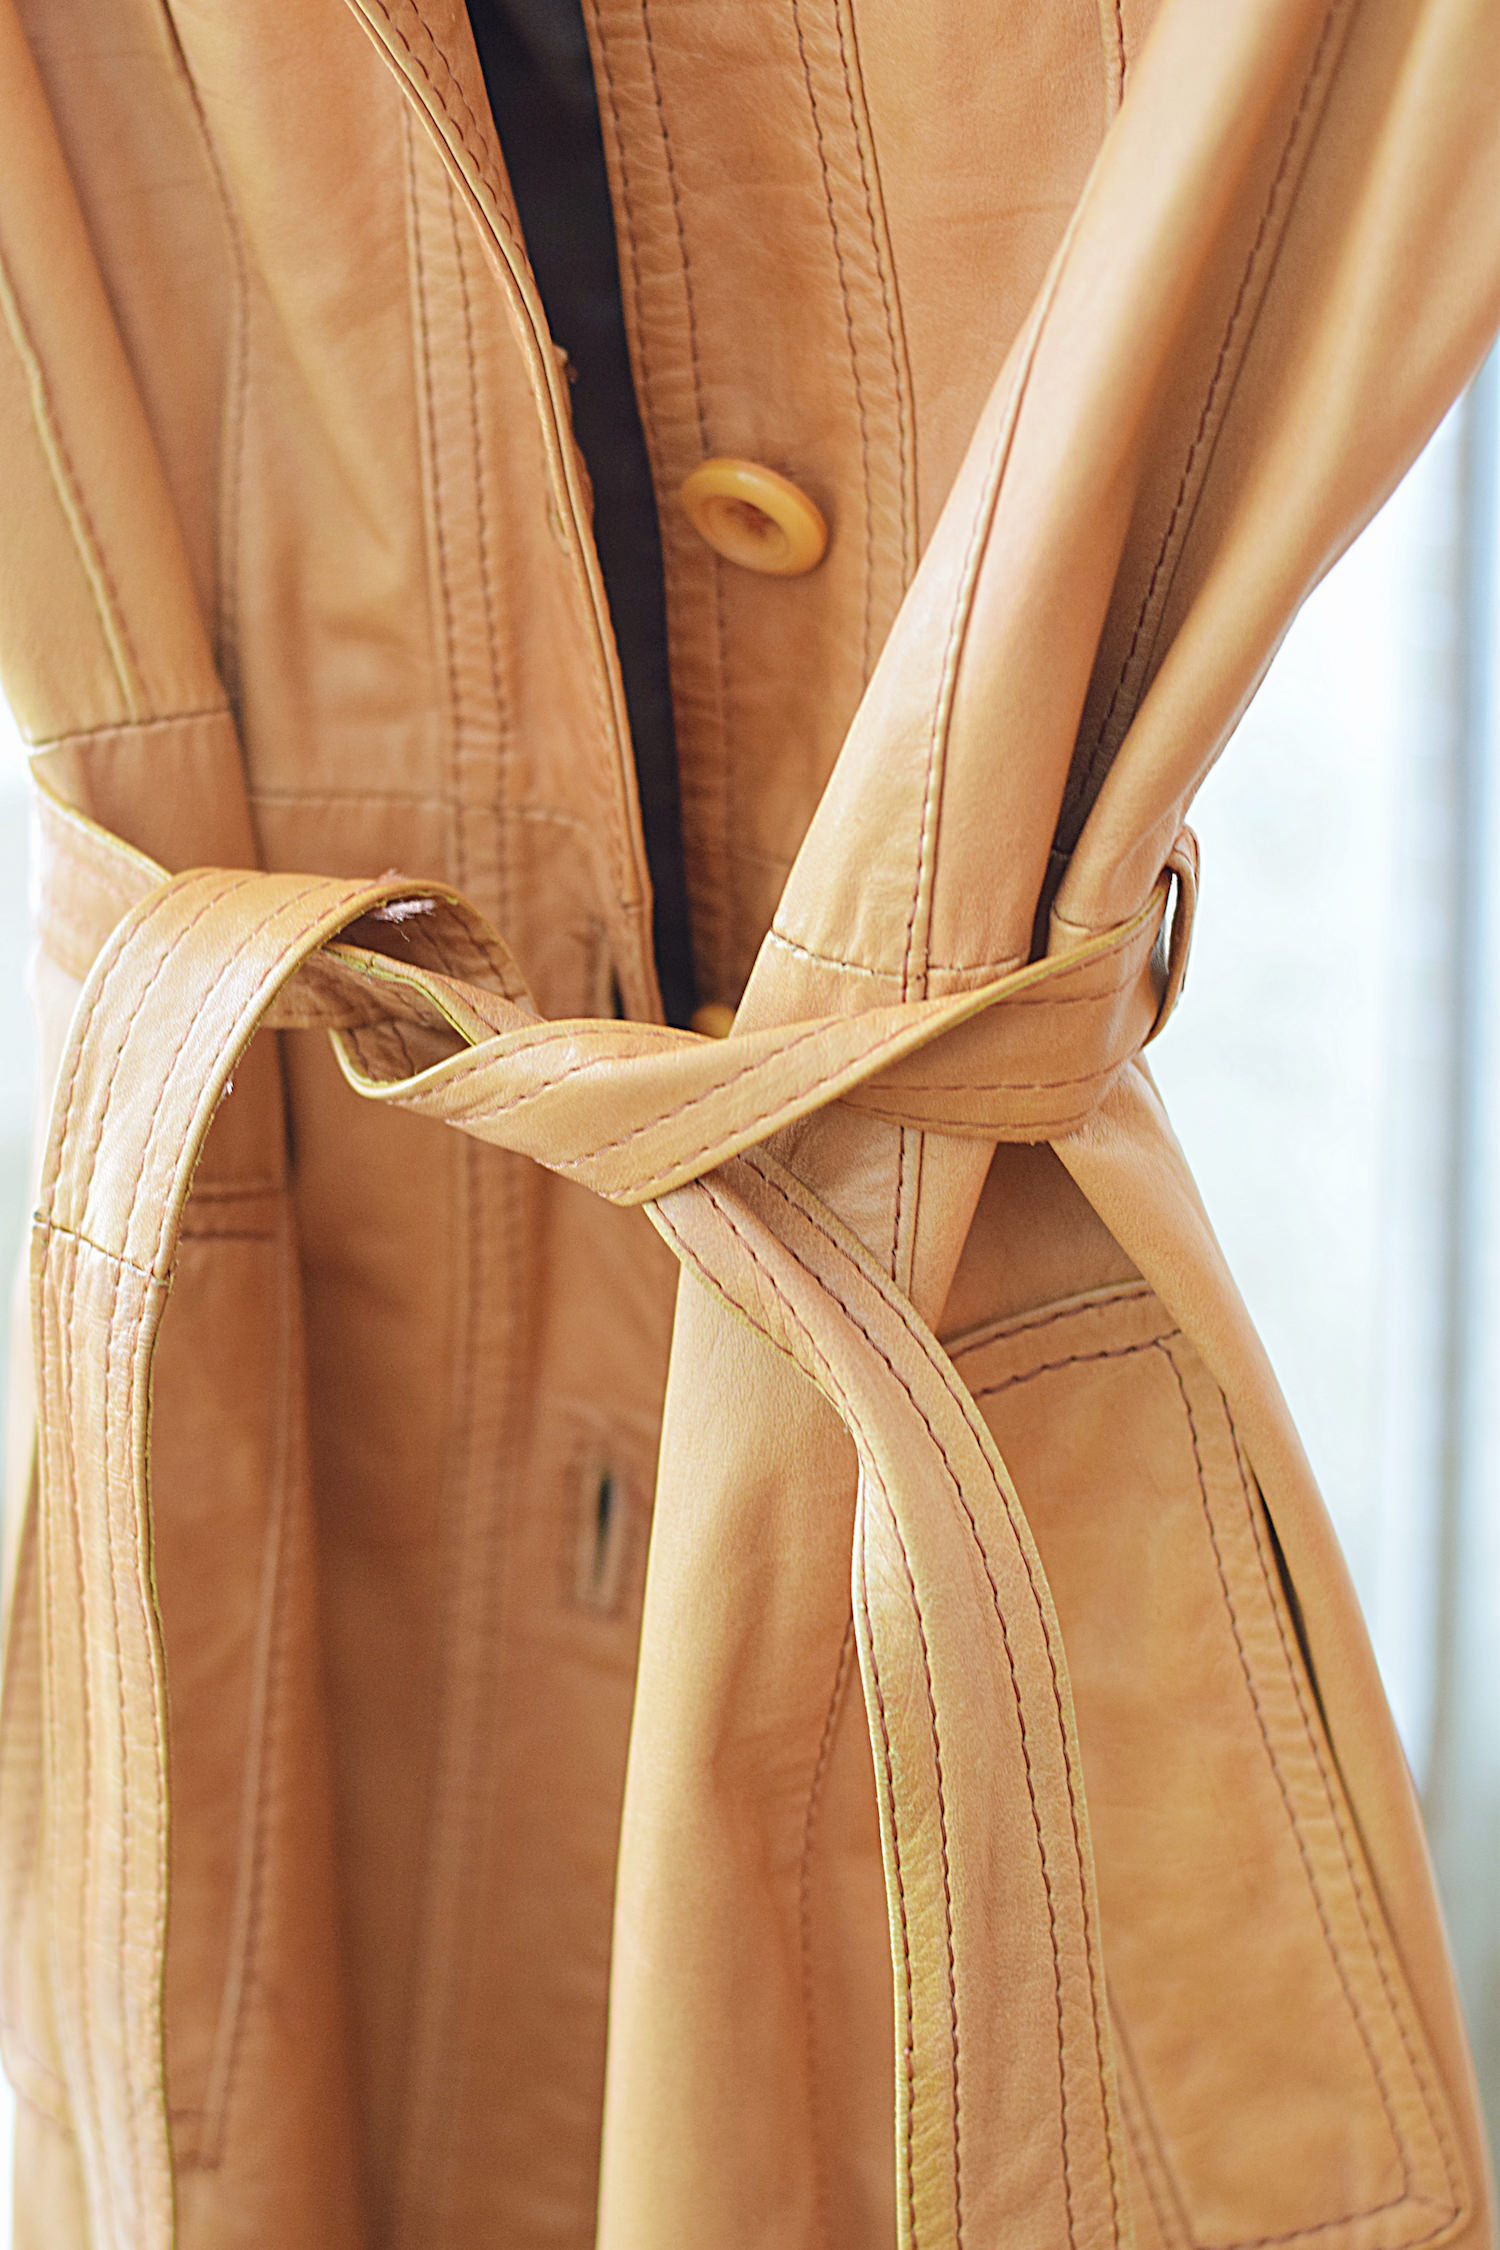 My top 10 vintage fashion finds | trufflesandtrends.com